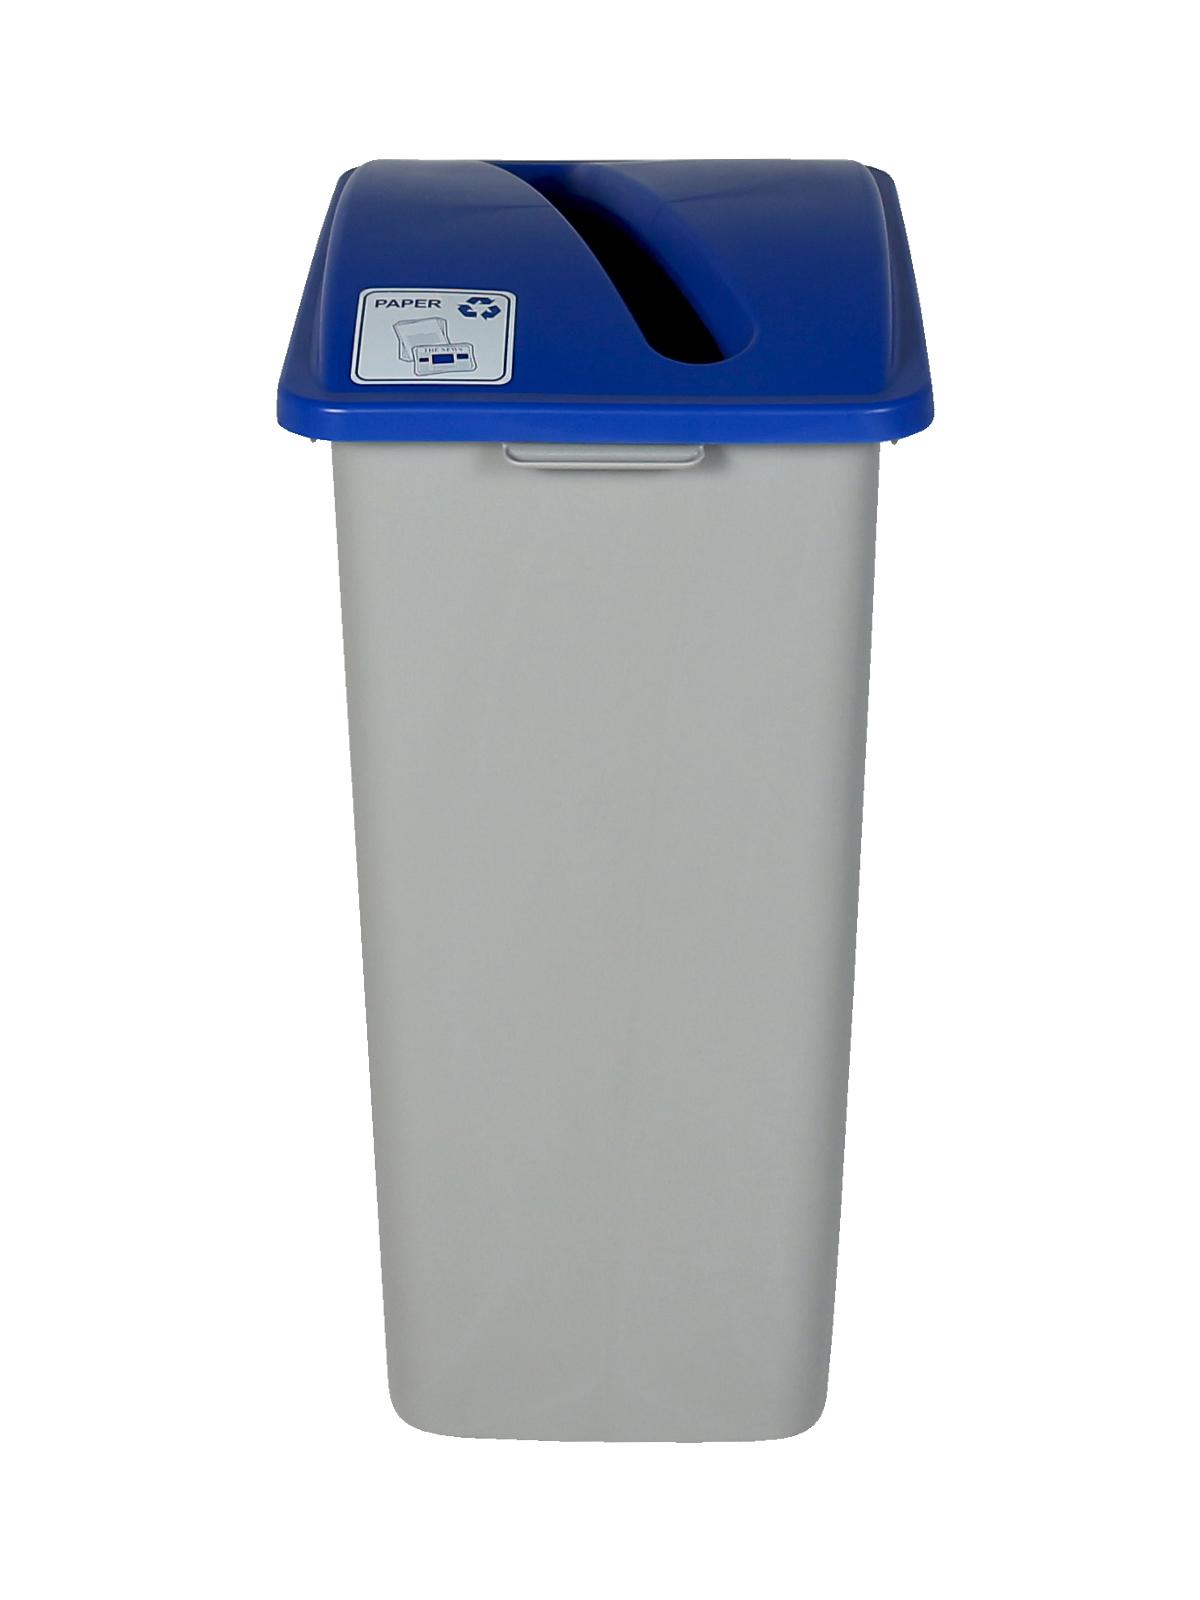 WASTE WATCHER XL - Single - Paper - Slot - Grey-Blue